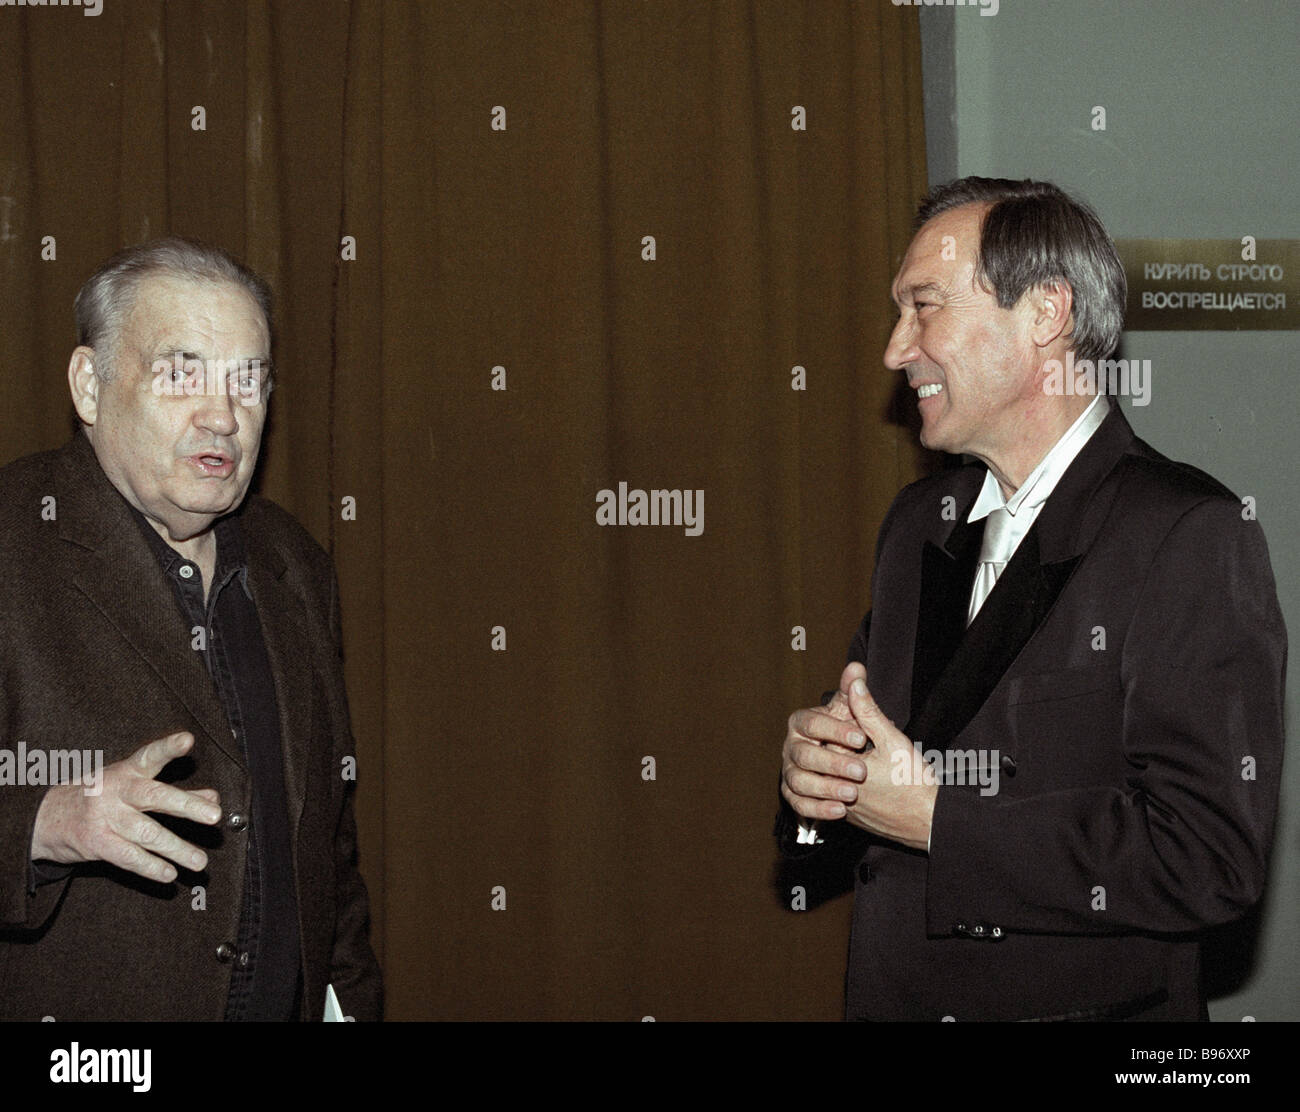 Why Eldar Ryazanov made a film Garage 56